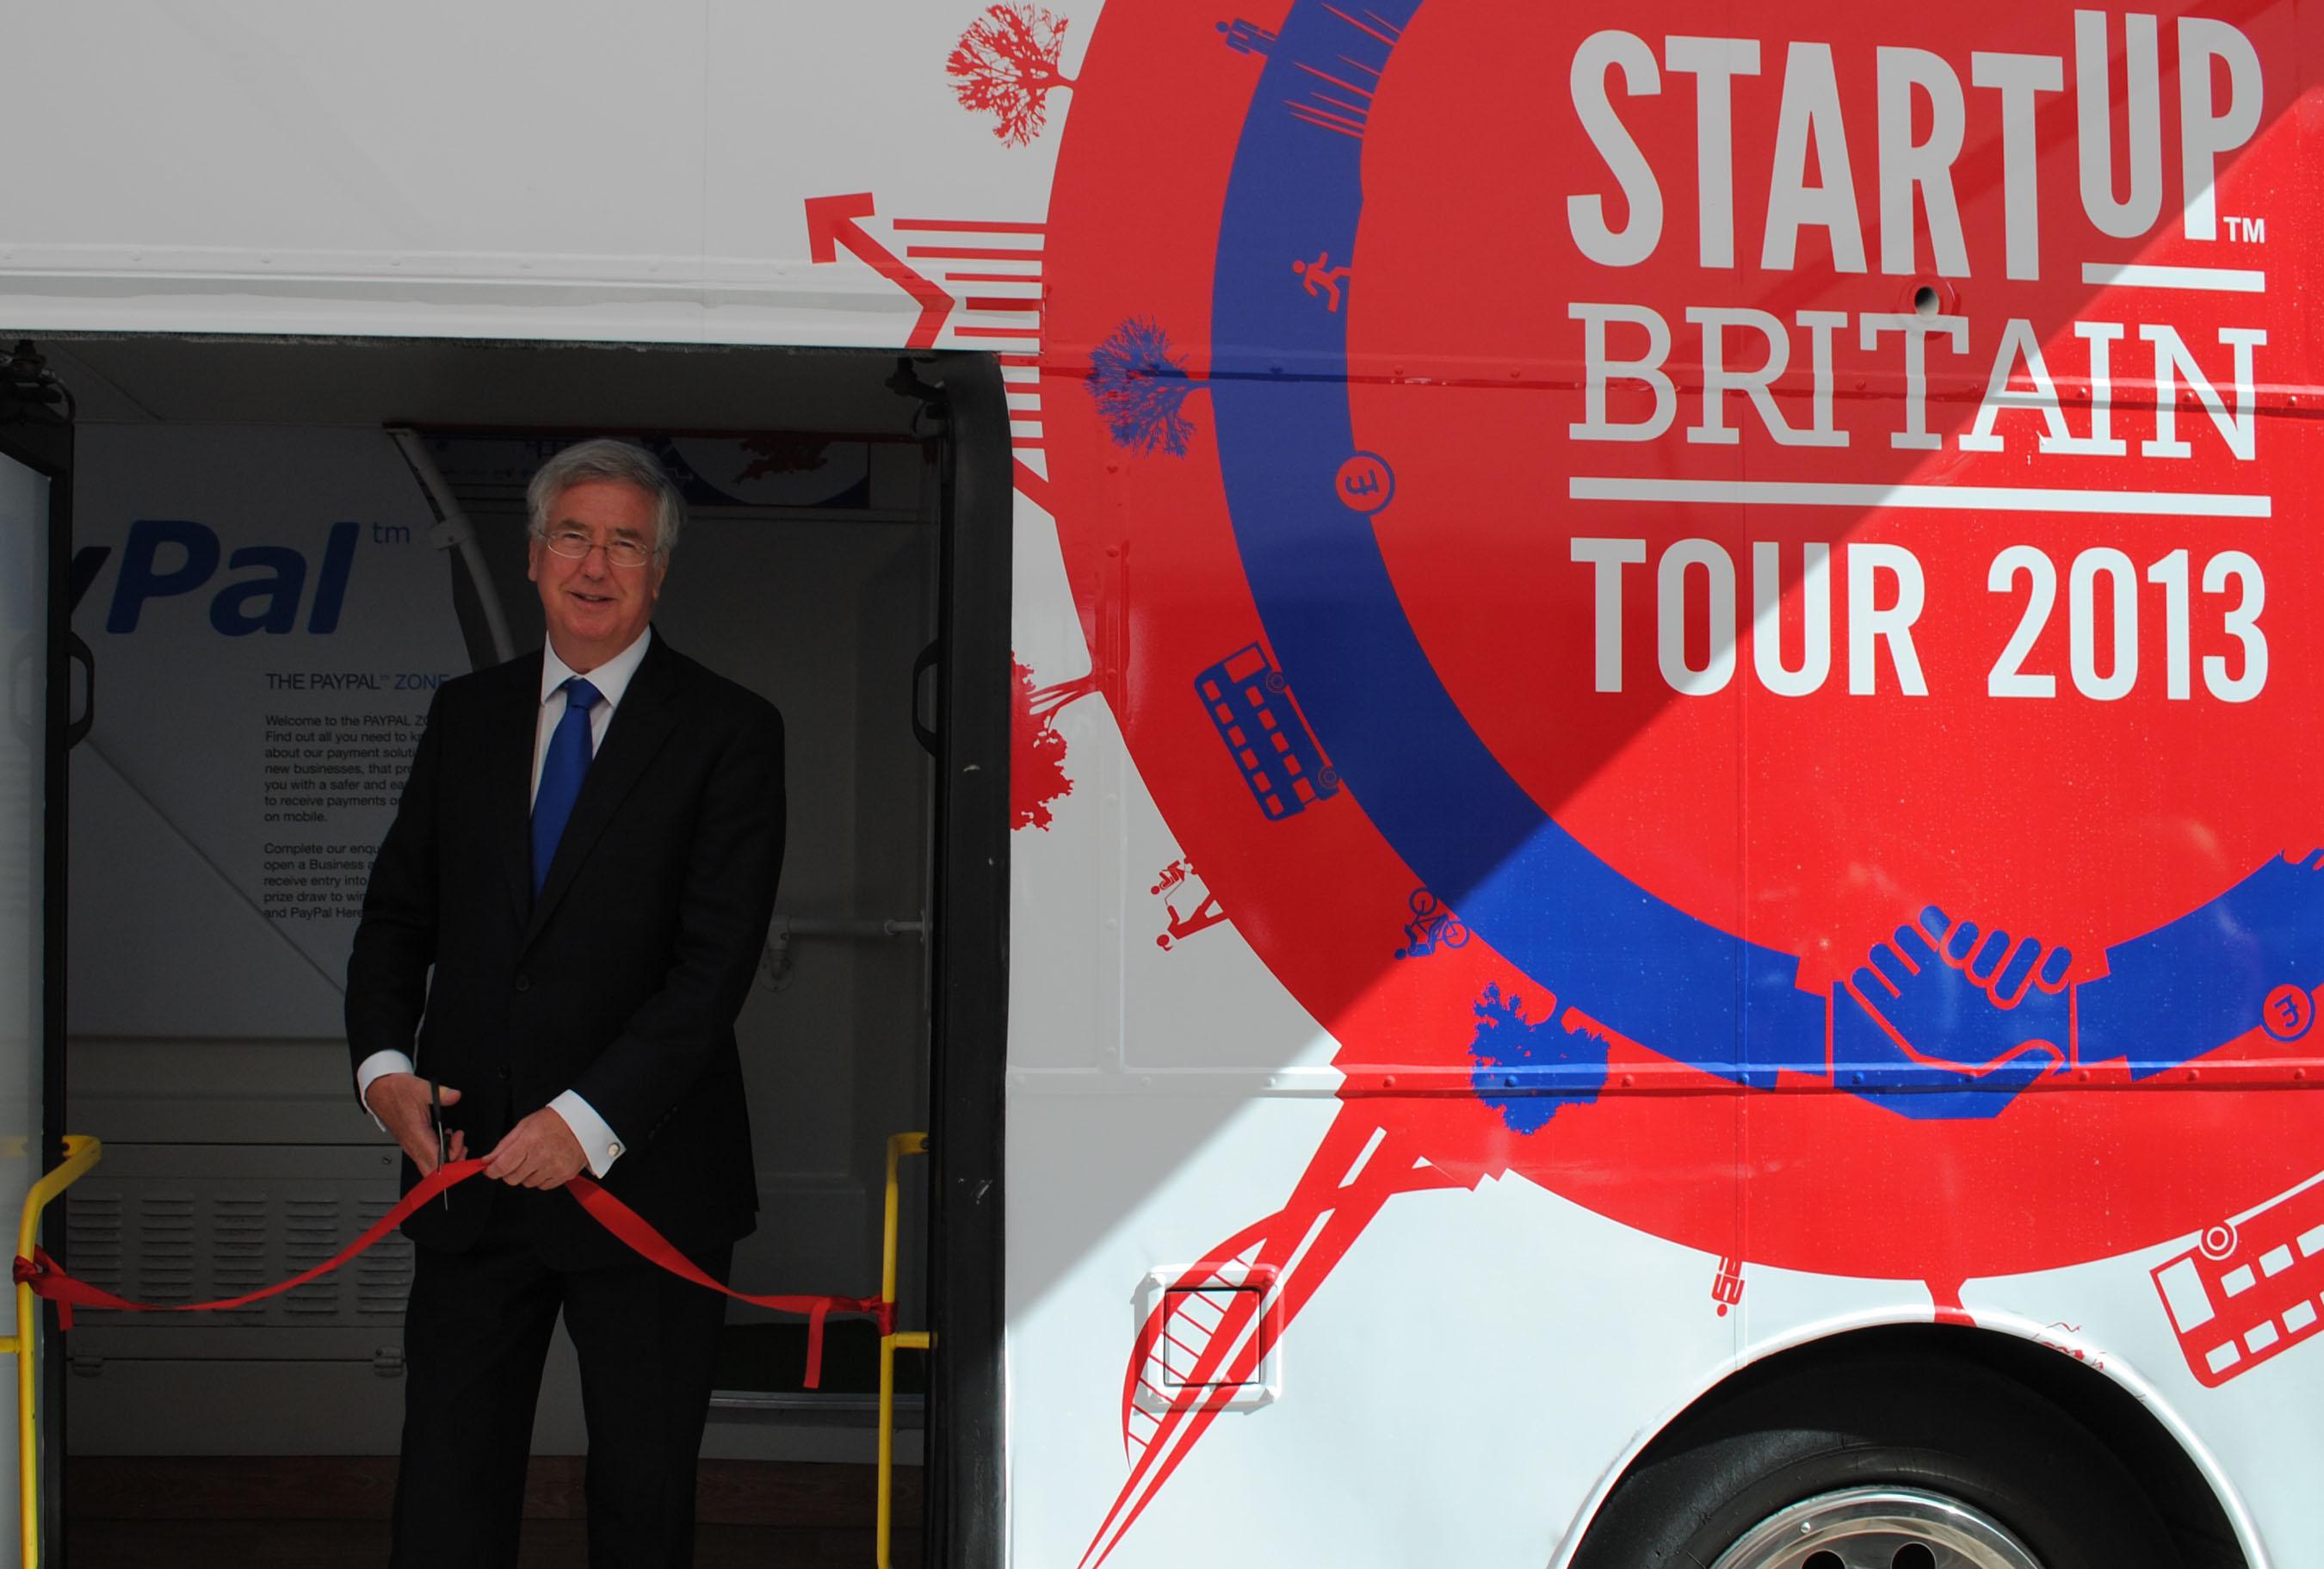 Jump aboard StartUp Britain?s tour bus